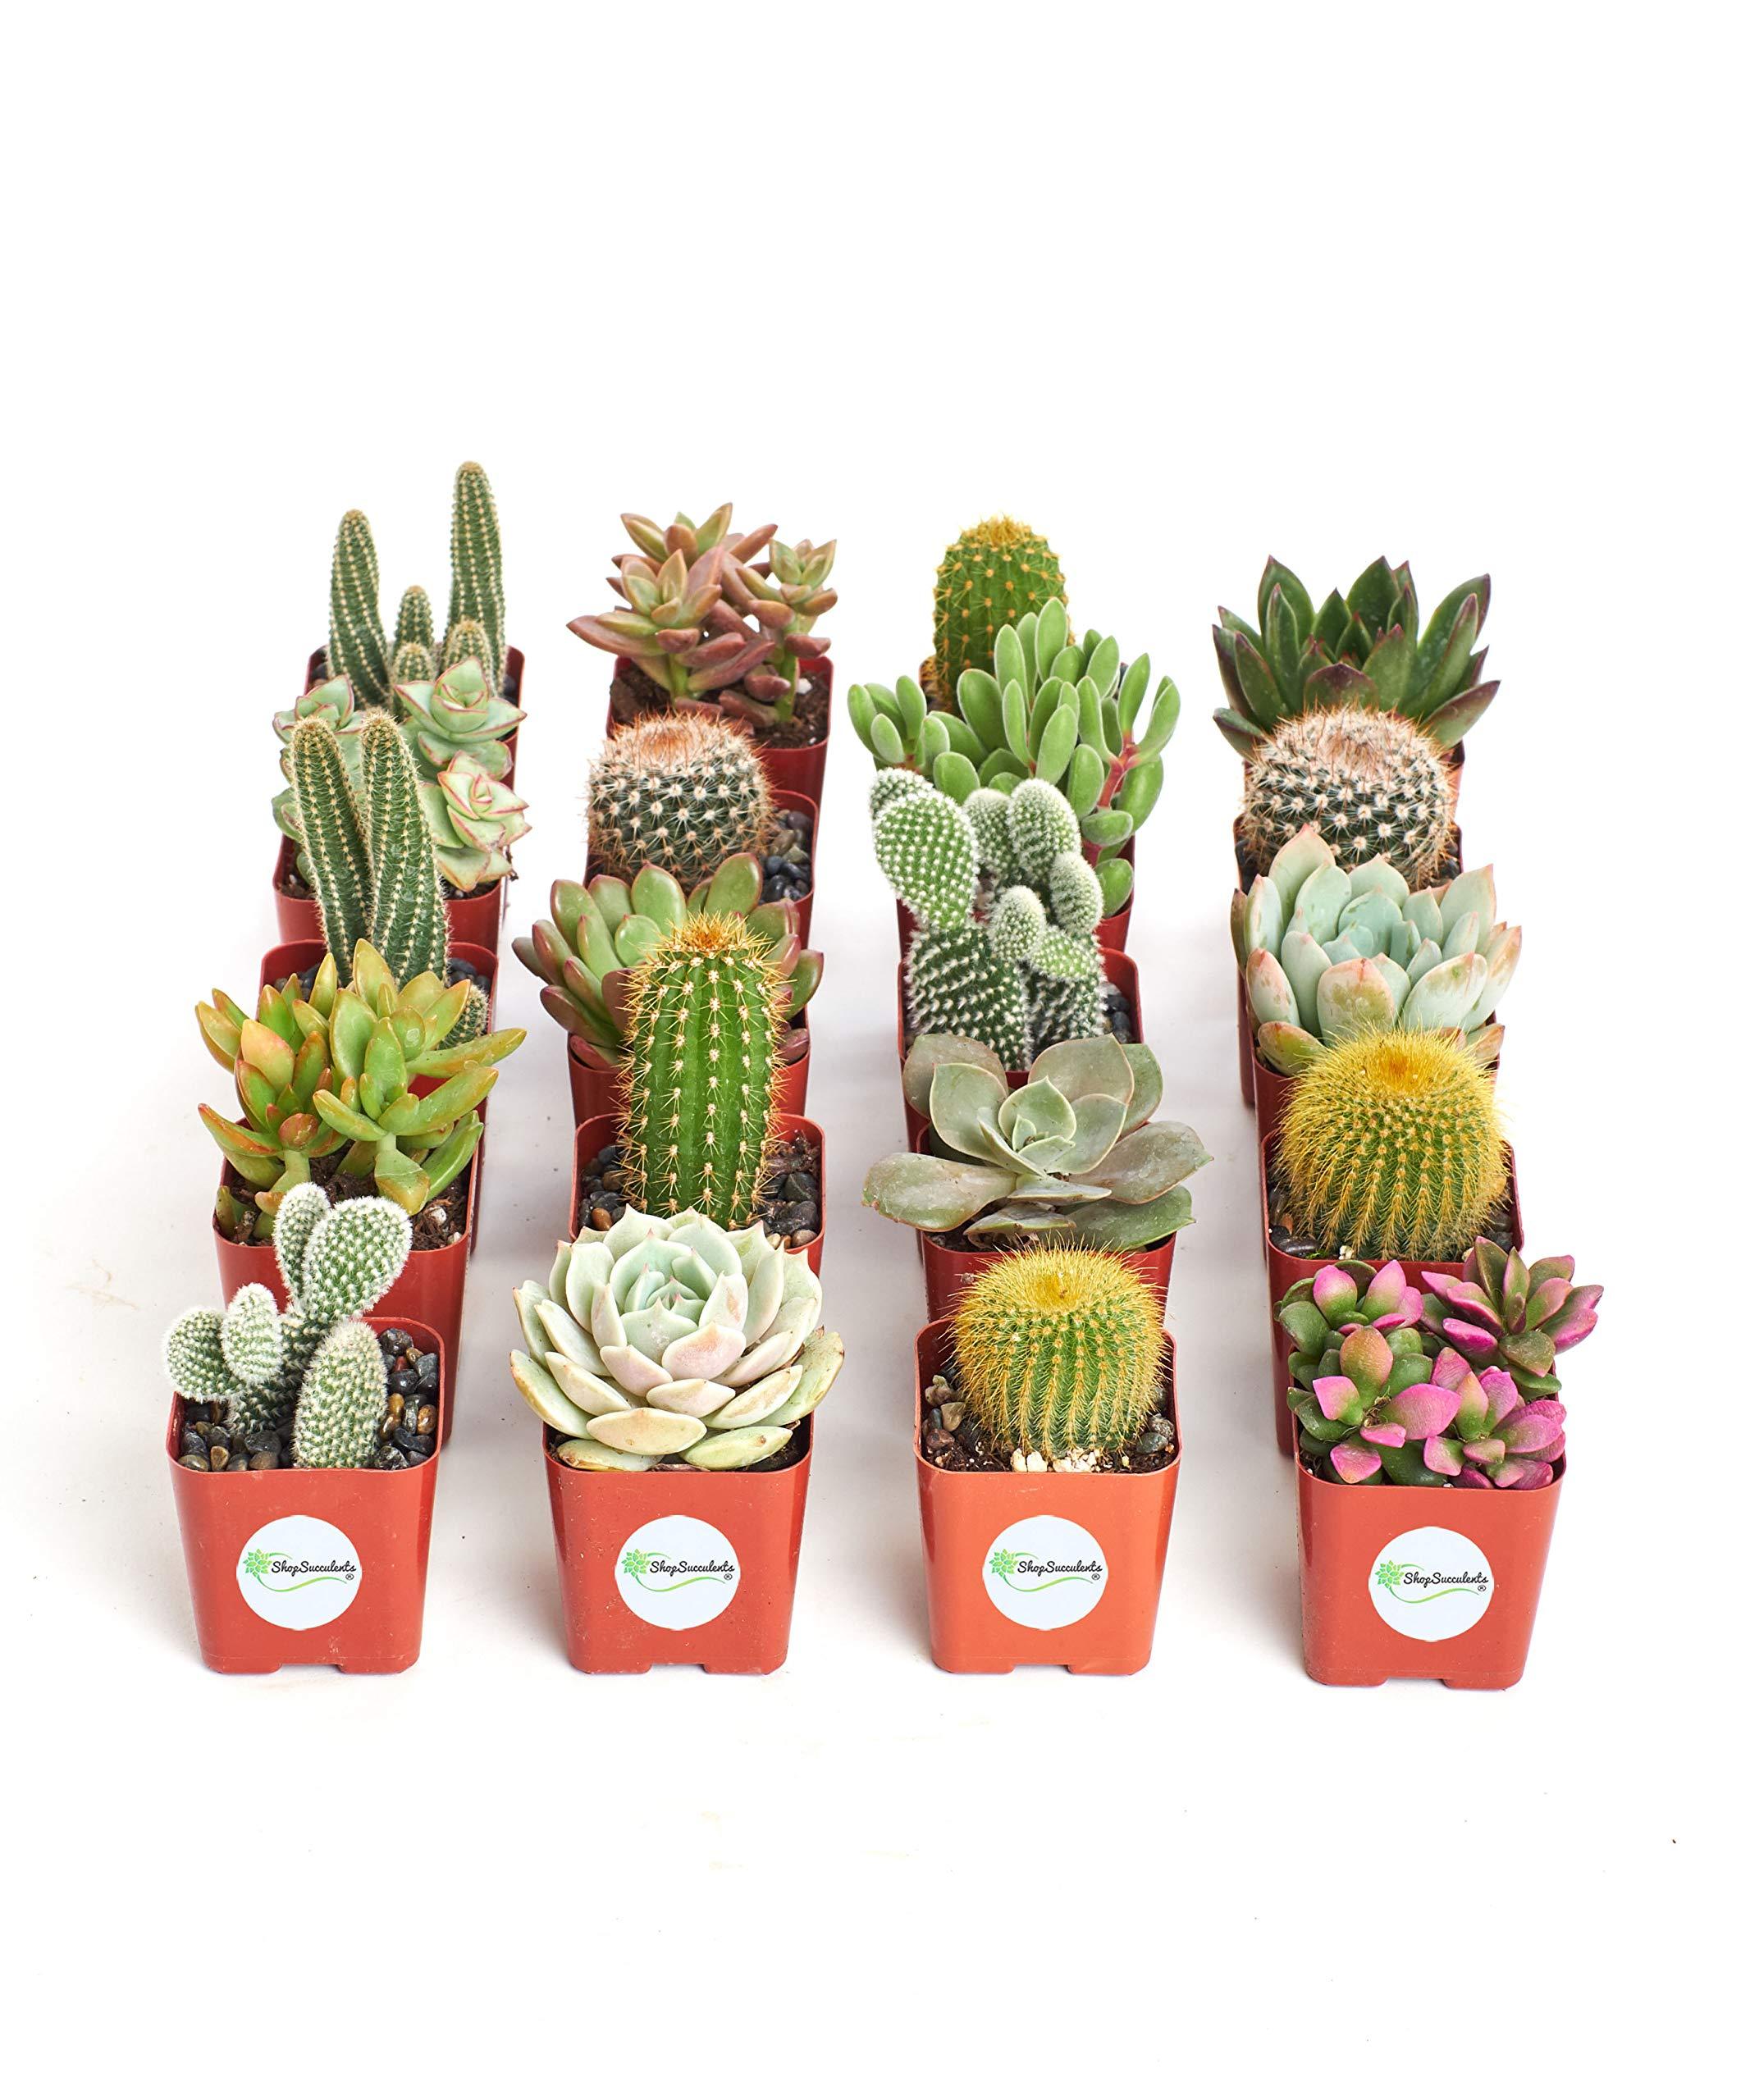 Shop Succulents | Cactus & Succulent Collection of Live Succulent Plants, Hand Selected Variety Pack of Cacti and Mini Succulents | Collection of 20 by Shop Succulents (Image #3)